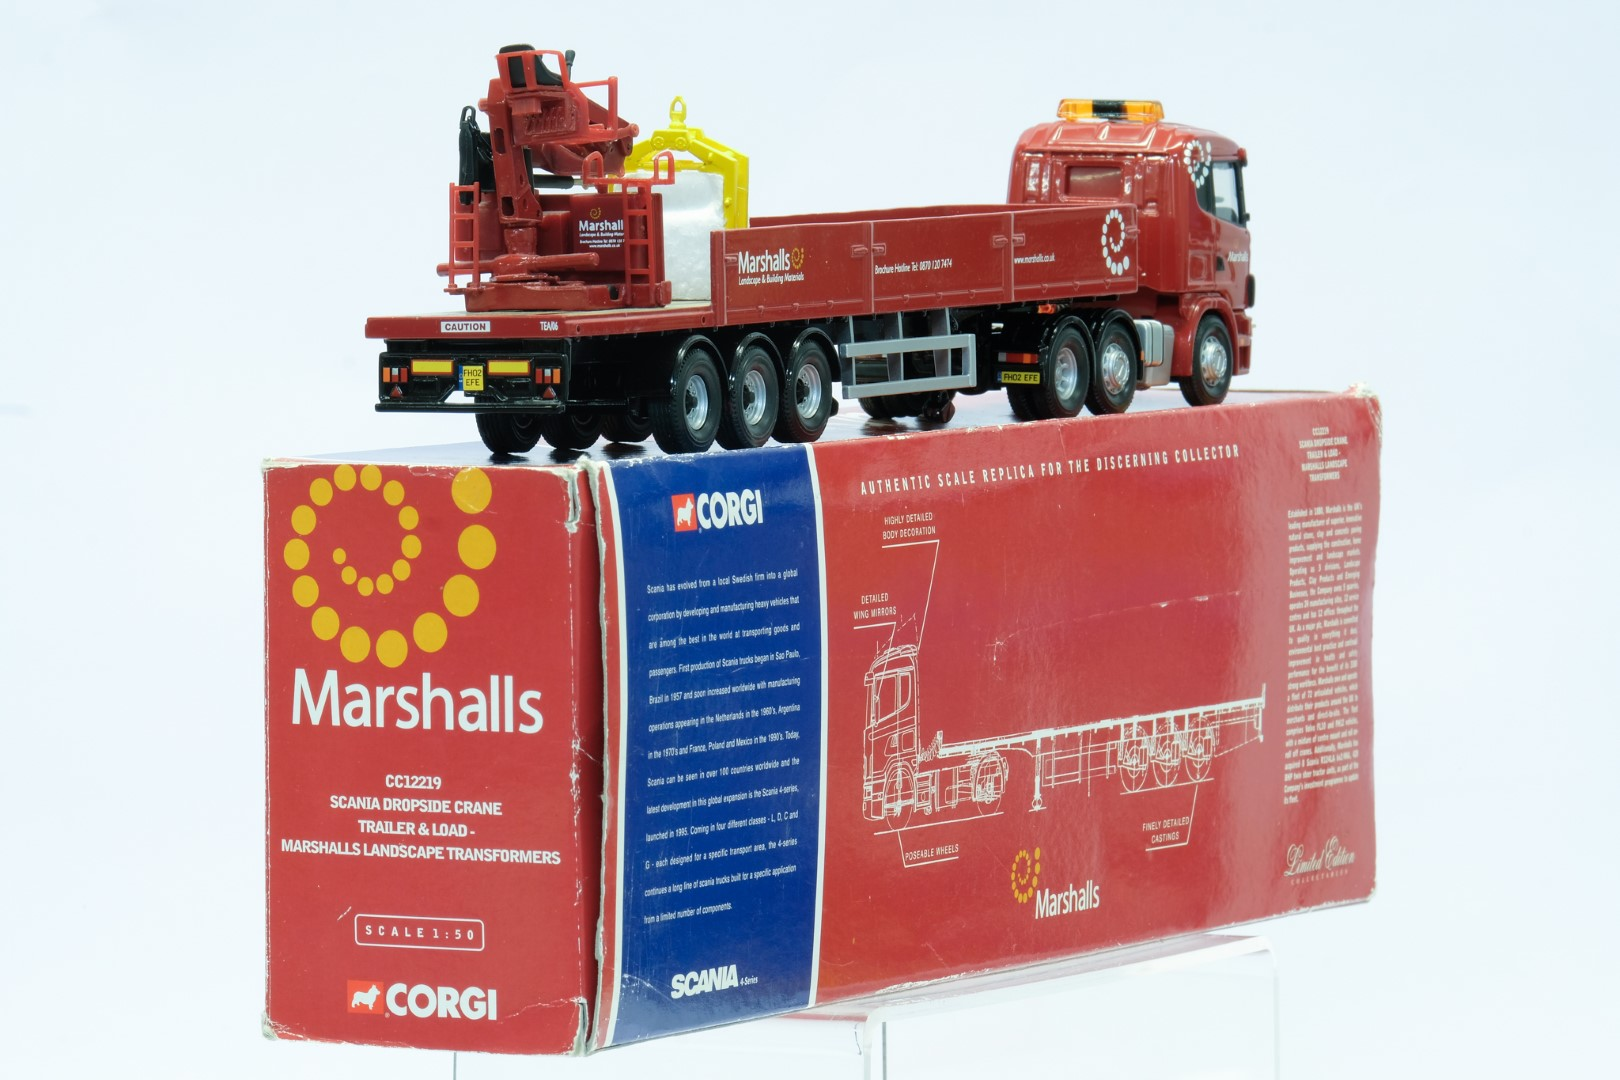 Corgi Marshalls Landscape Transformers Scania Dropside Crane Trailer & Load - Image 3 of 3